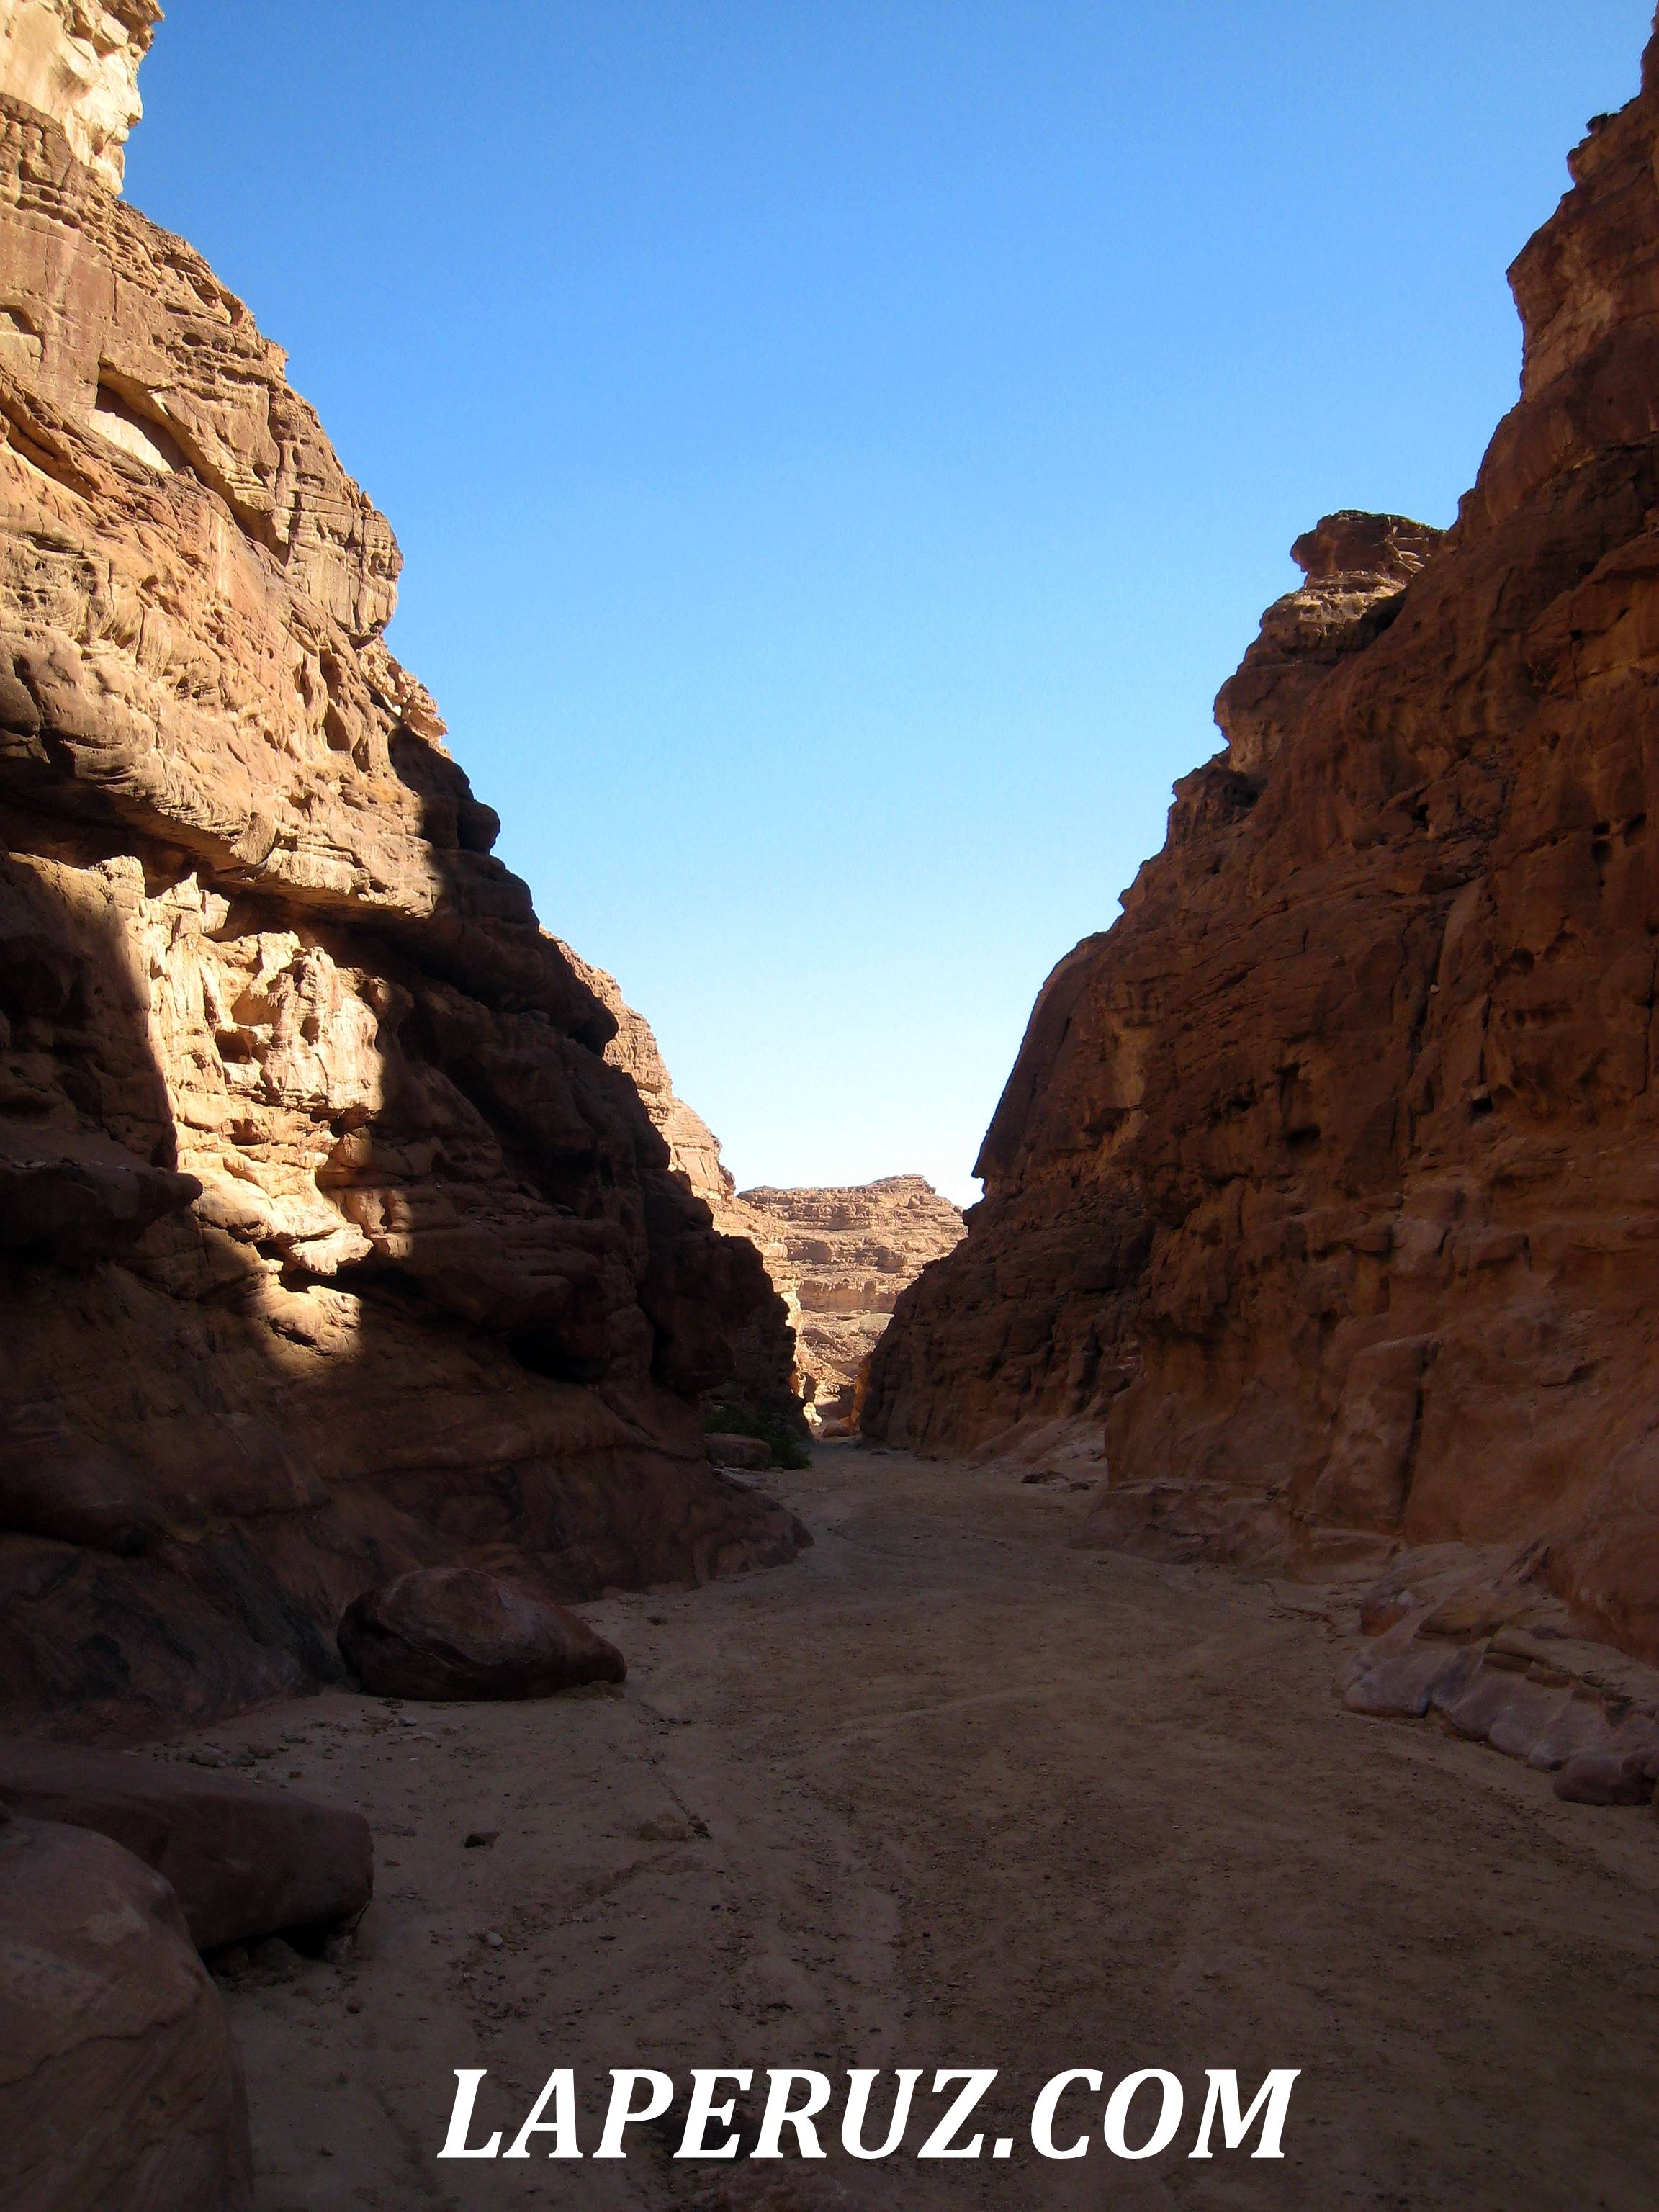 cvetnoi_kanyon_egypt_13